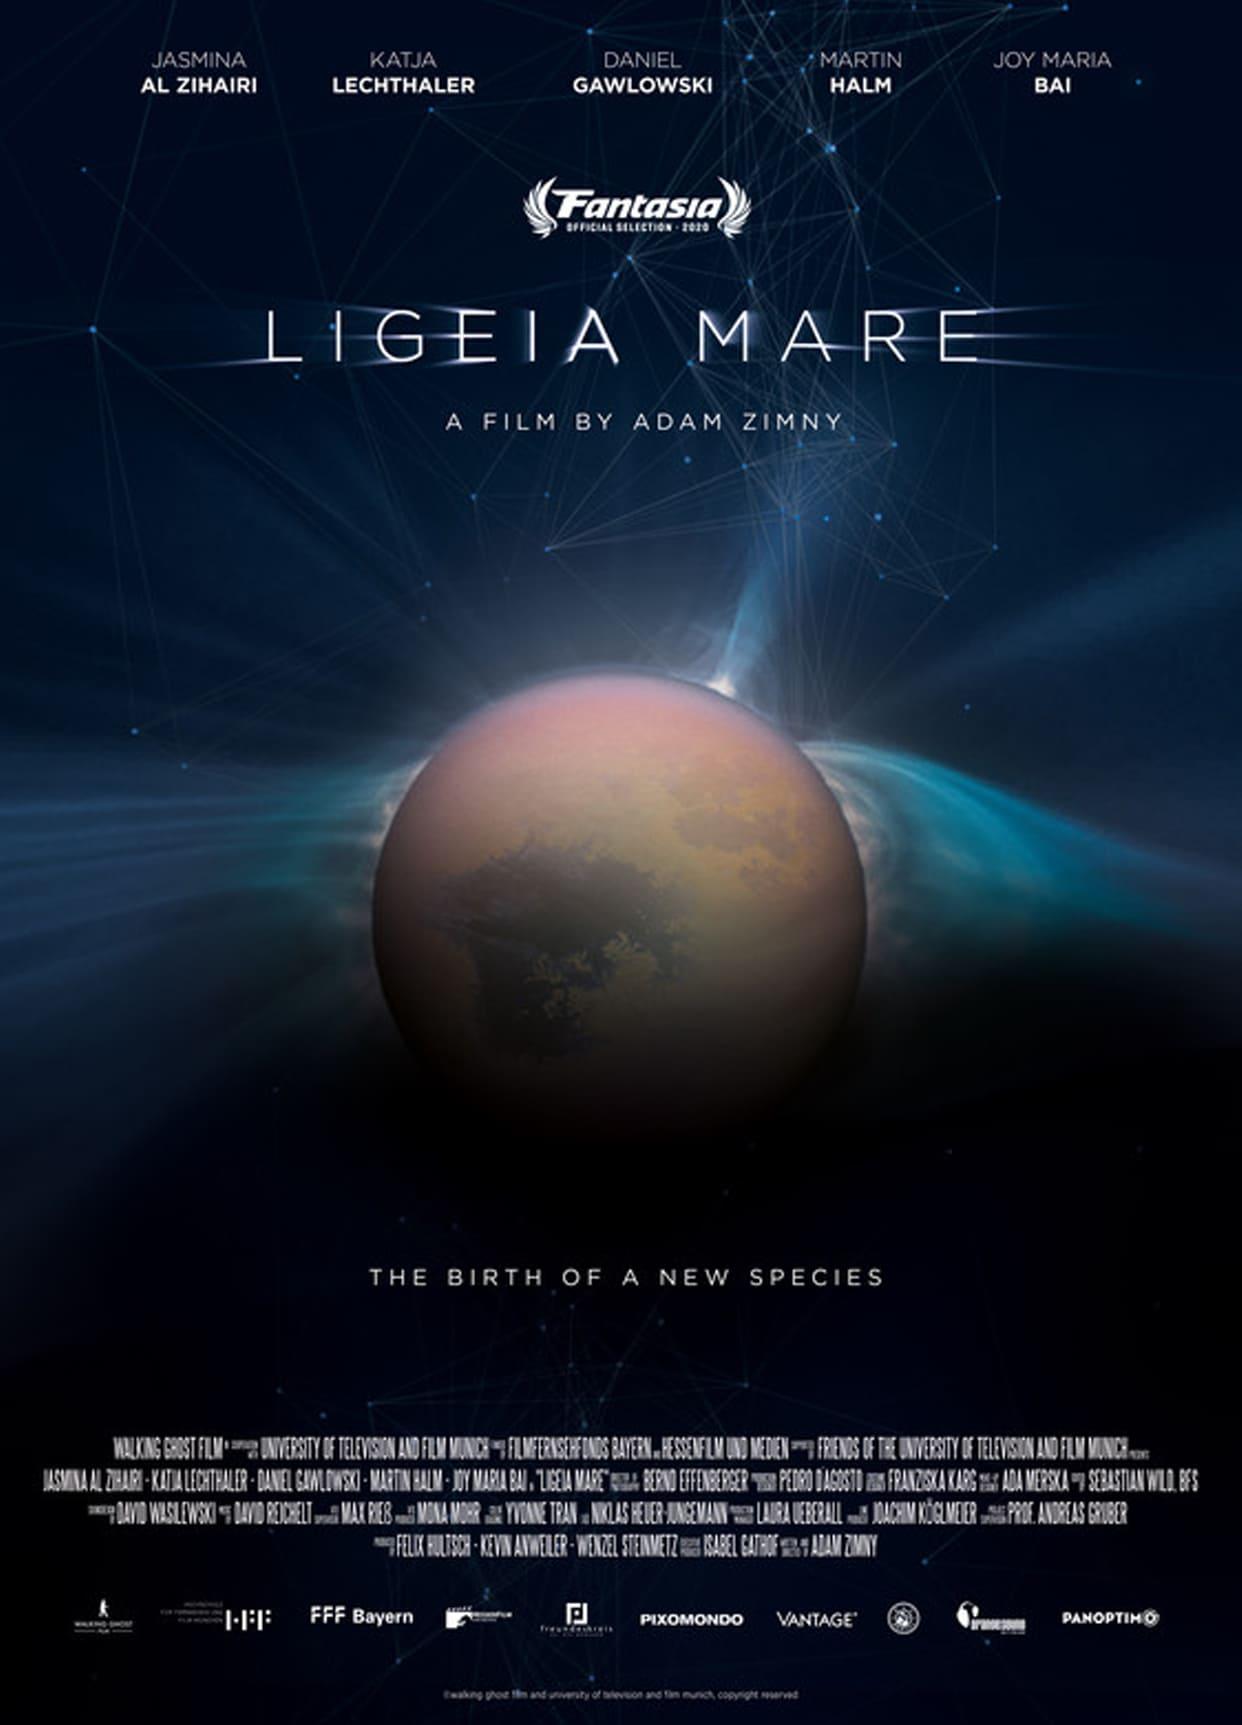 LIGEIA MARE